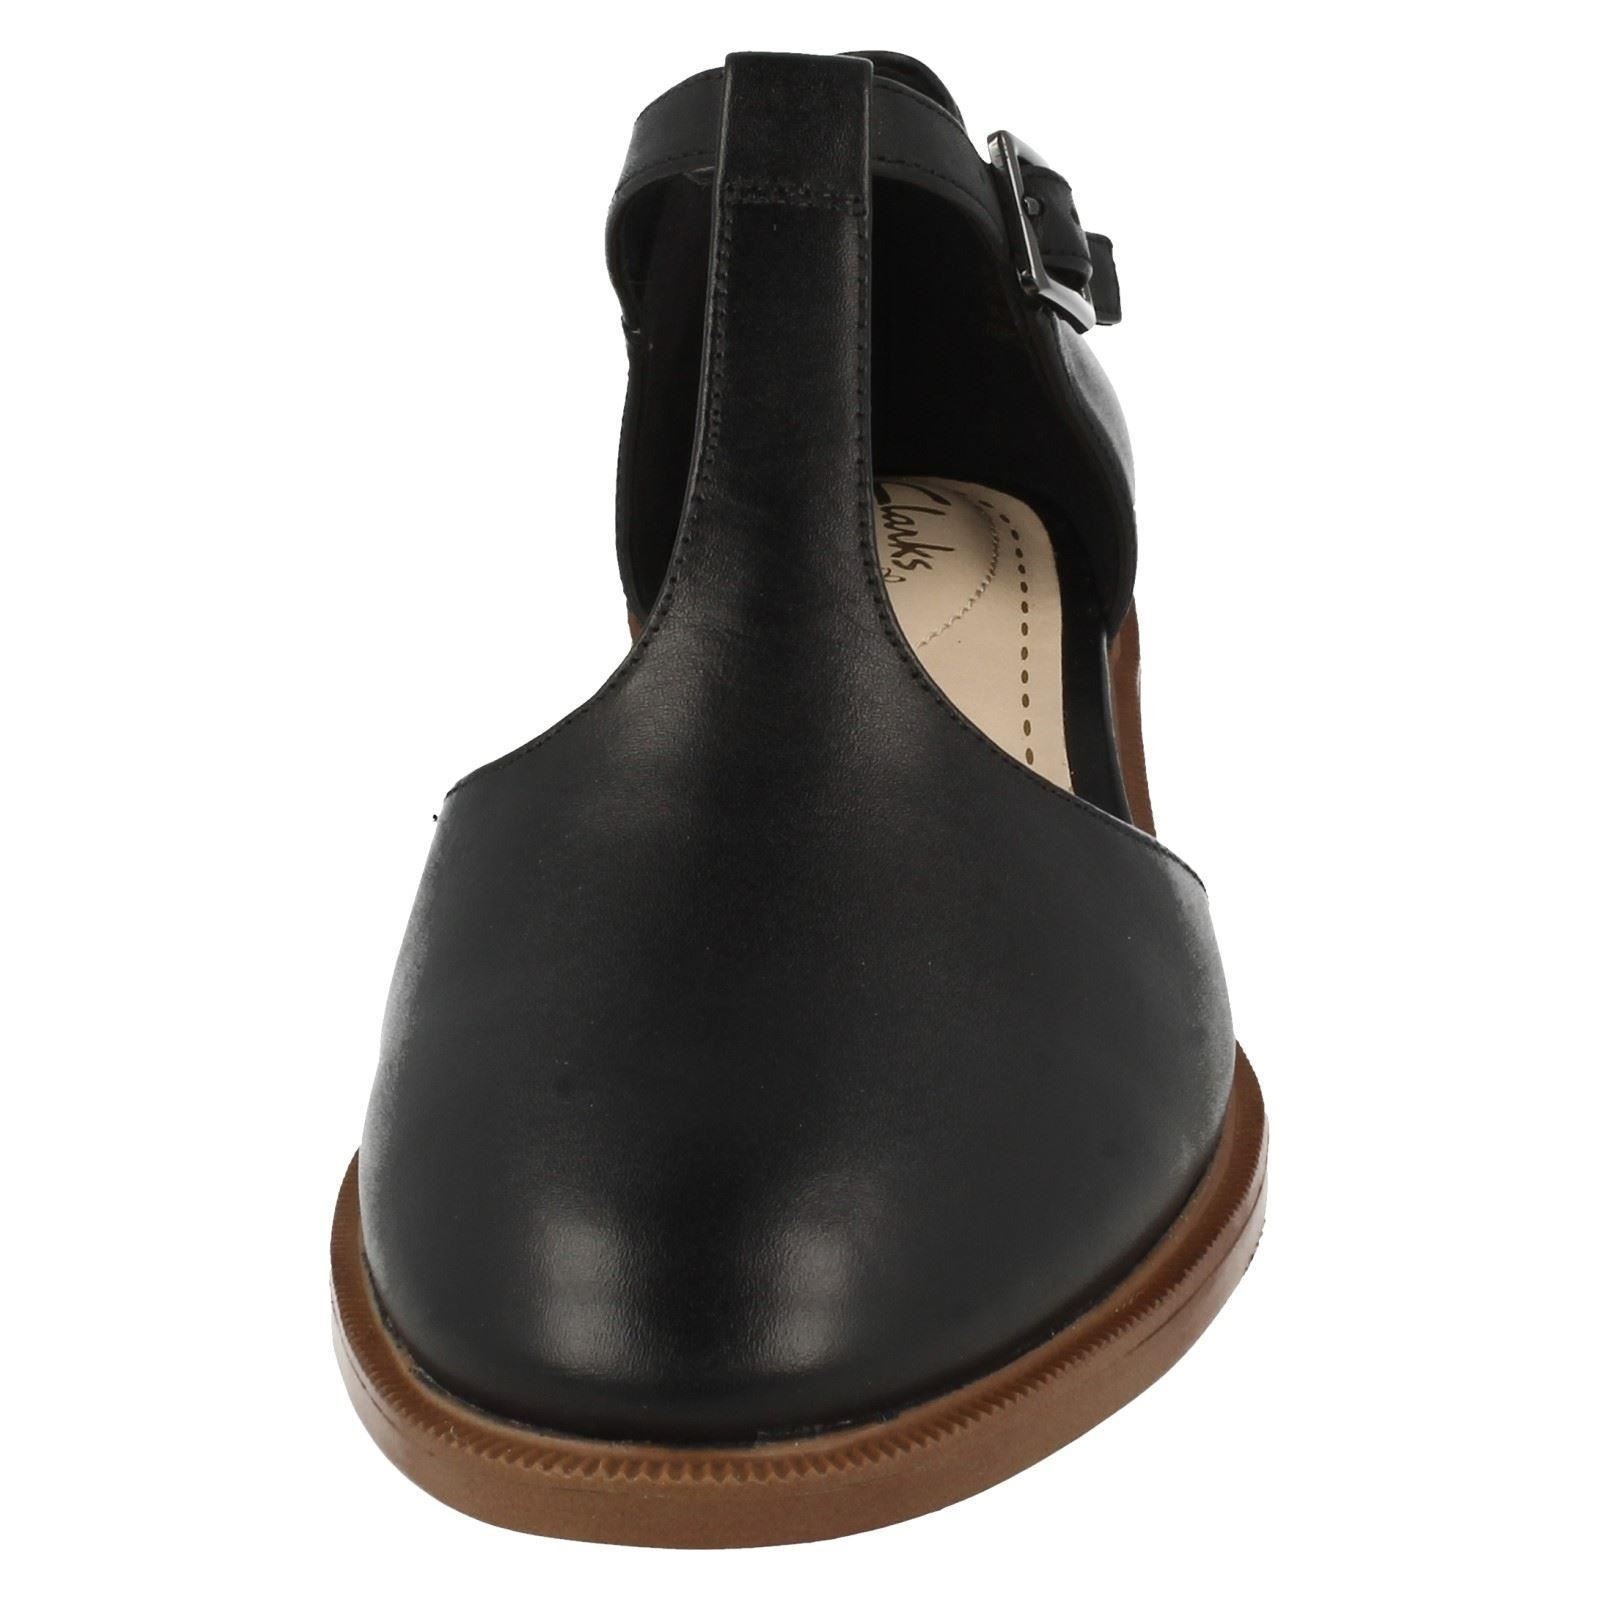 Ladies Clarks Flat Shoes Taylor Palm | EBay